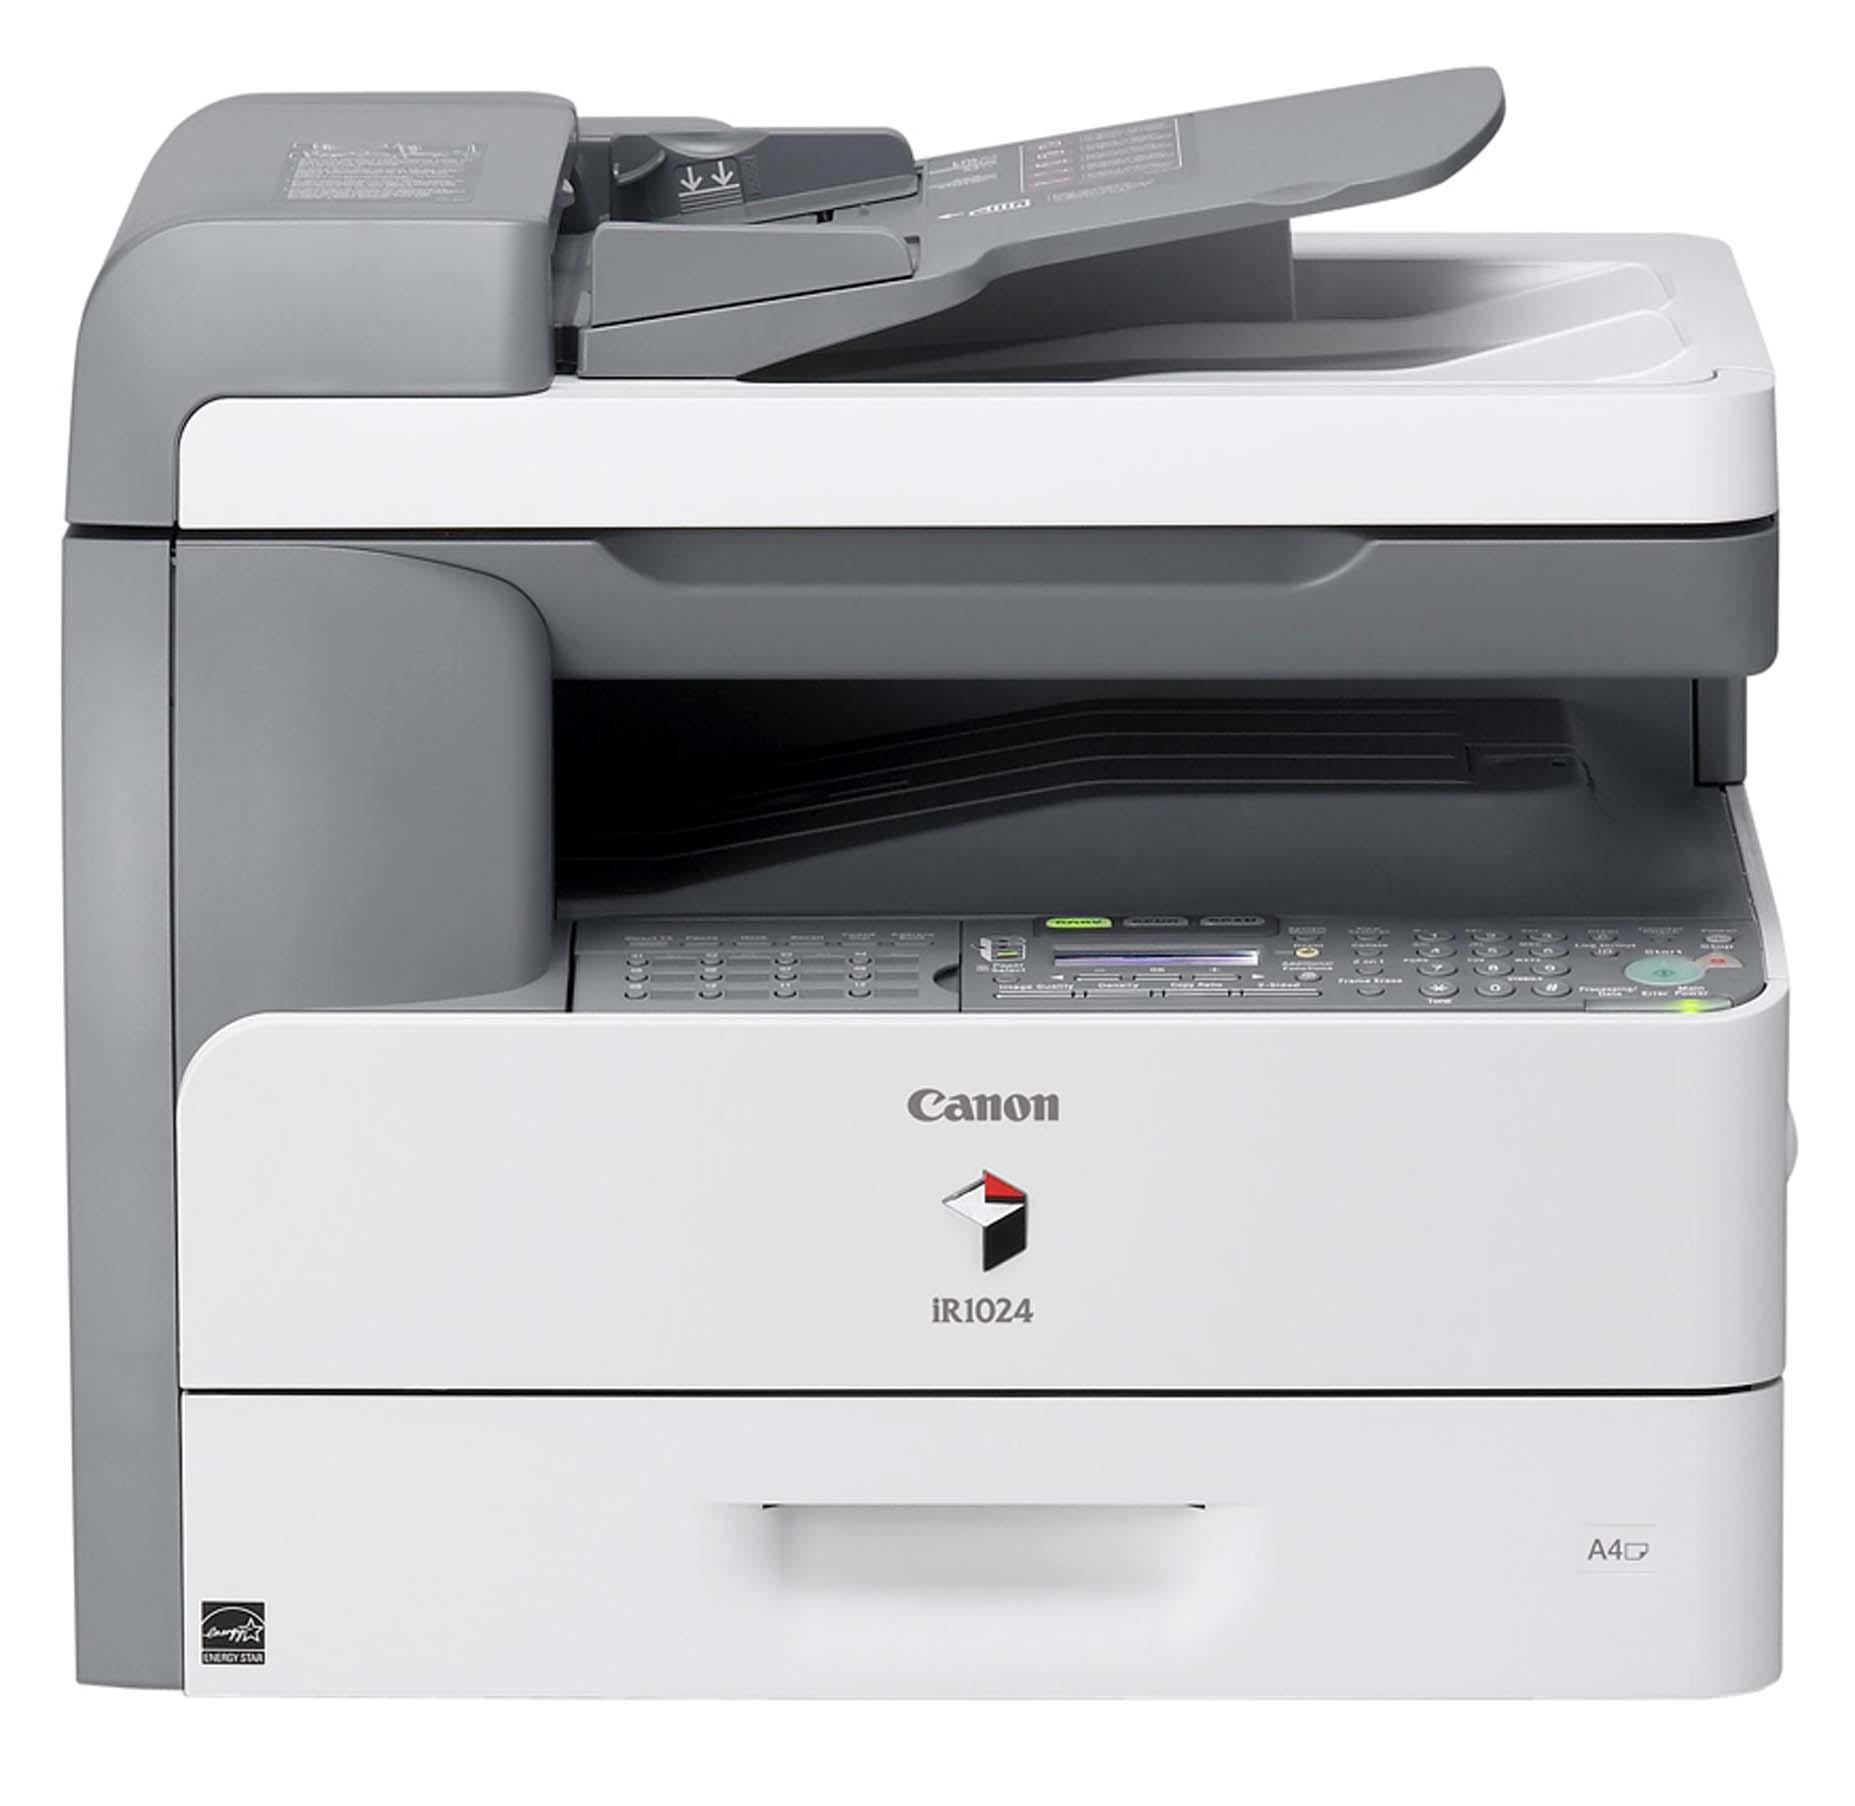 Harga mesin fotocopy canon ir 1024 42